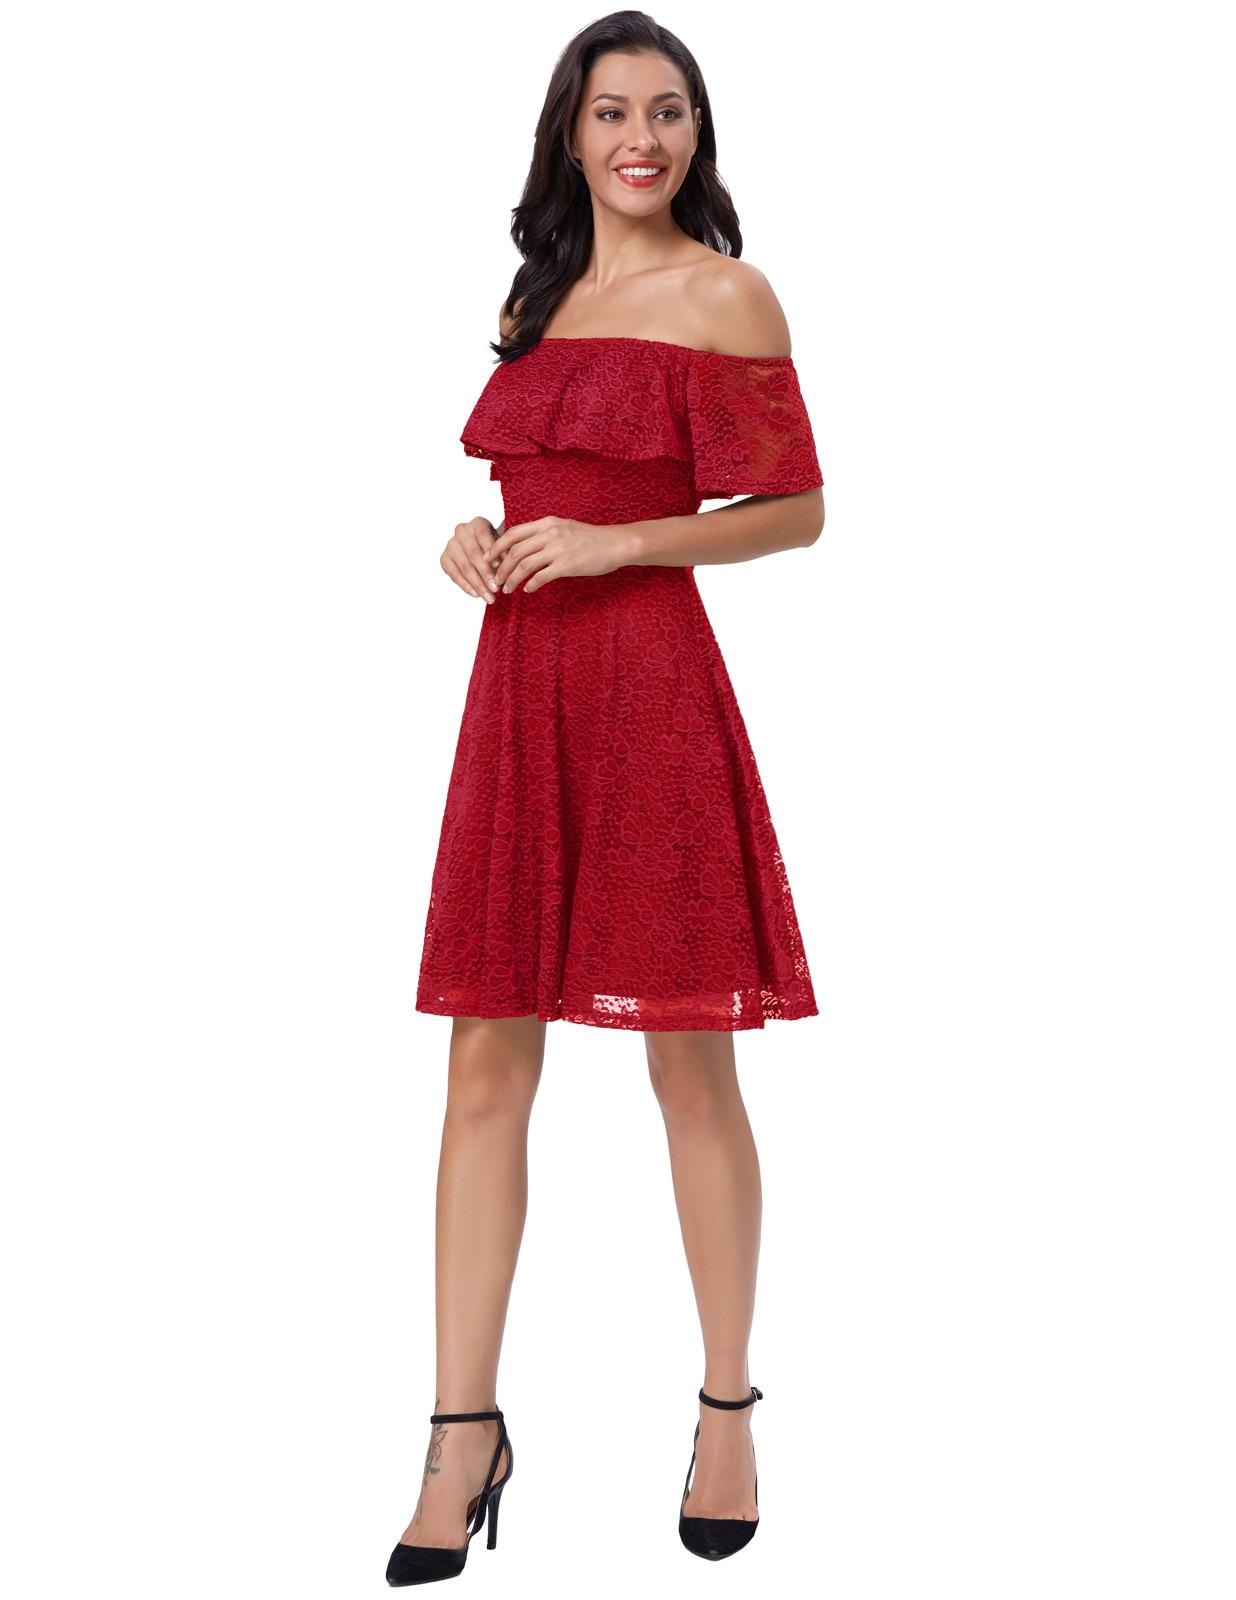 2018 New Lace Dress Womens Summer Blue Black Ruffle Sexy Slash Neck Off Shoulder Fashion Casual Womens Mini Dress